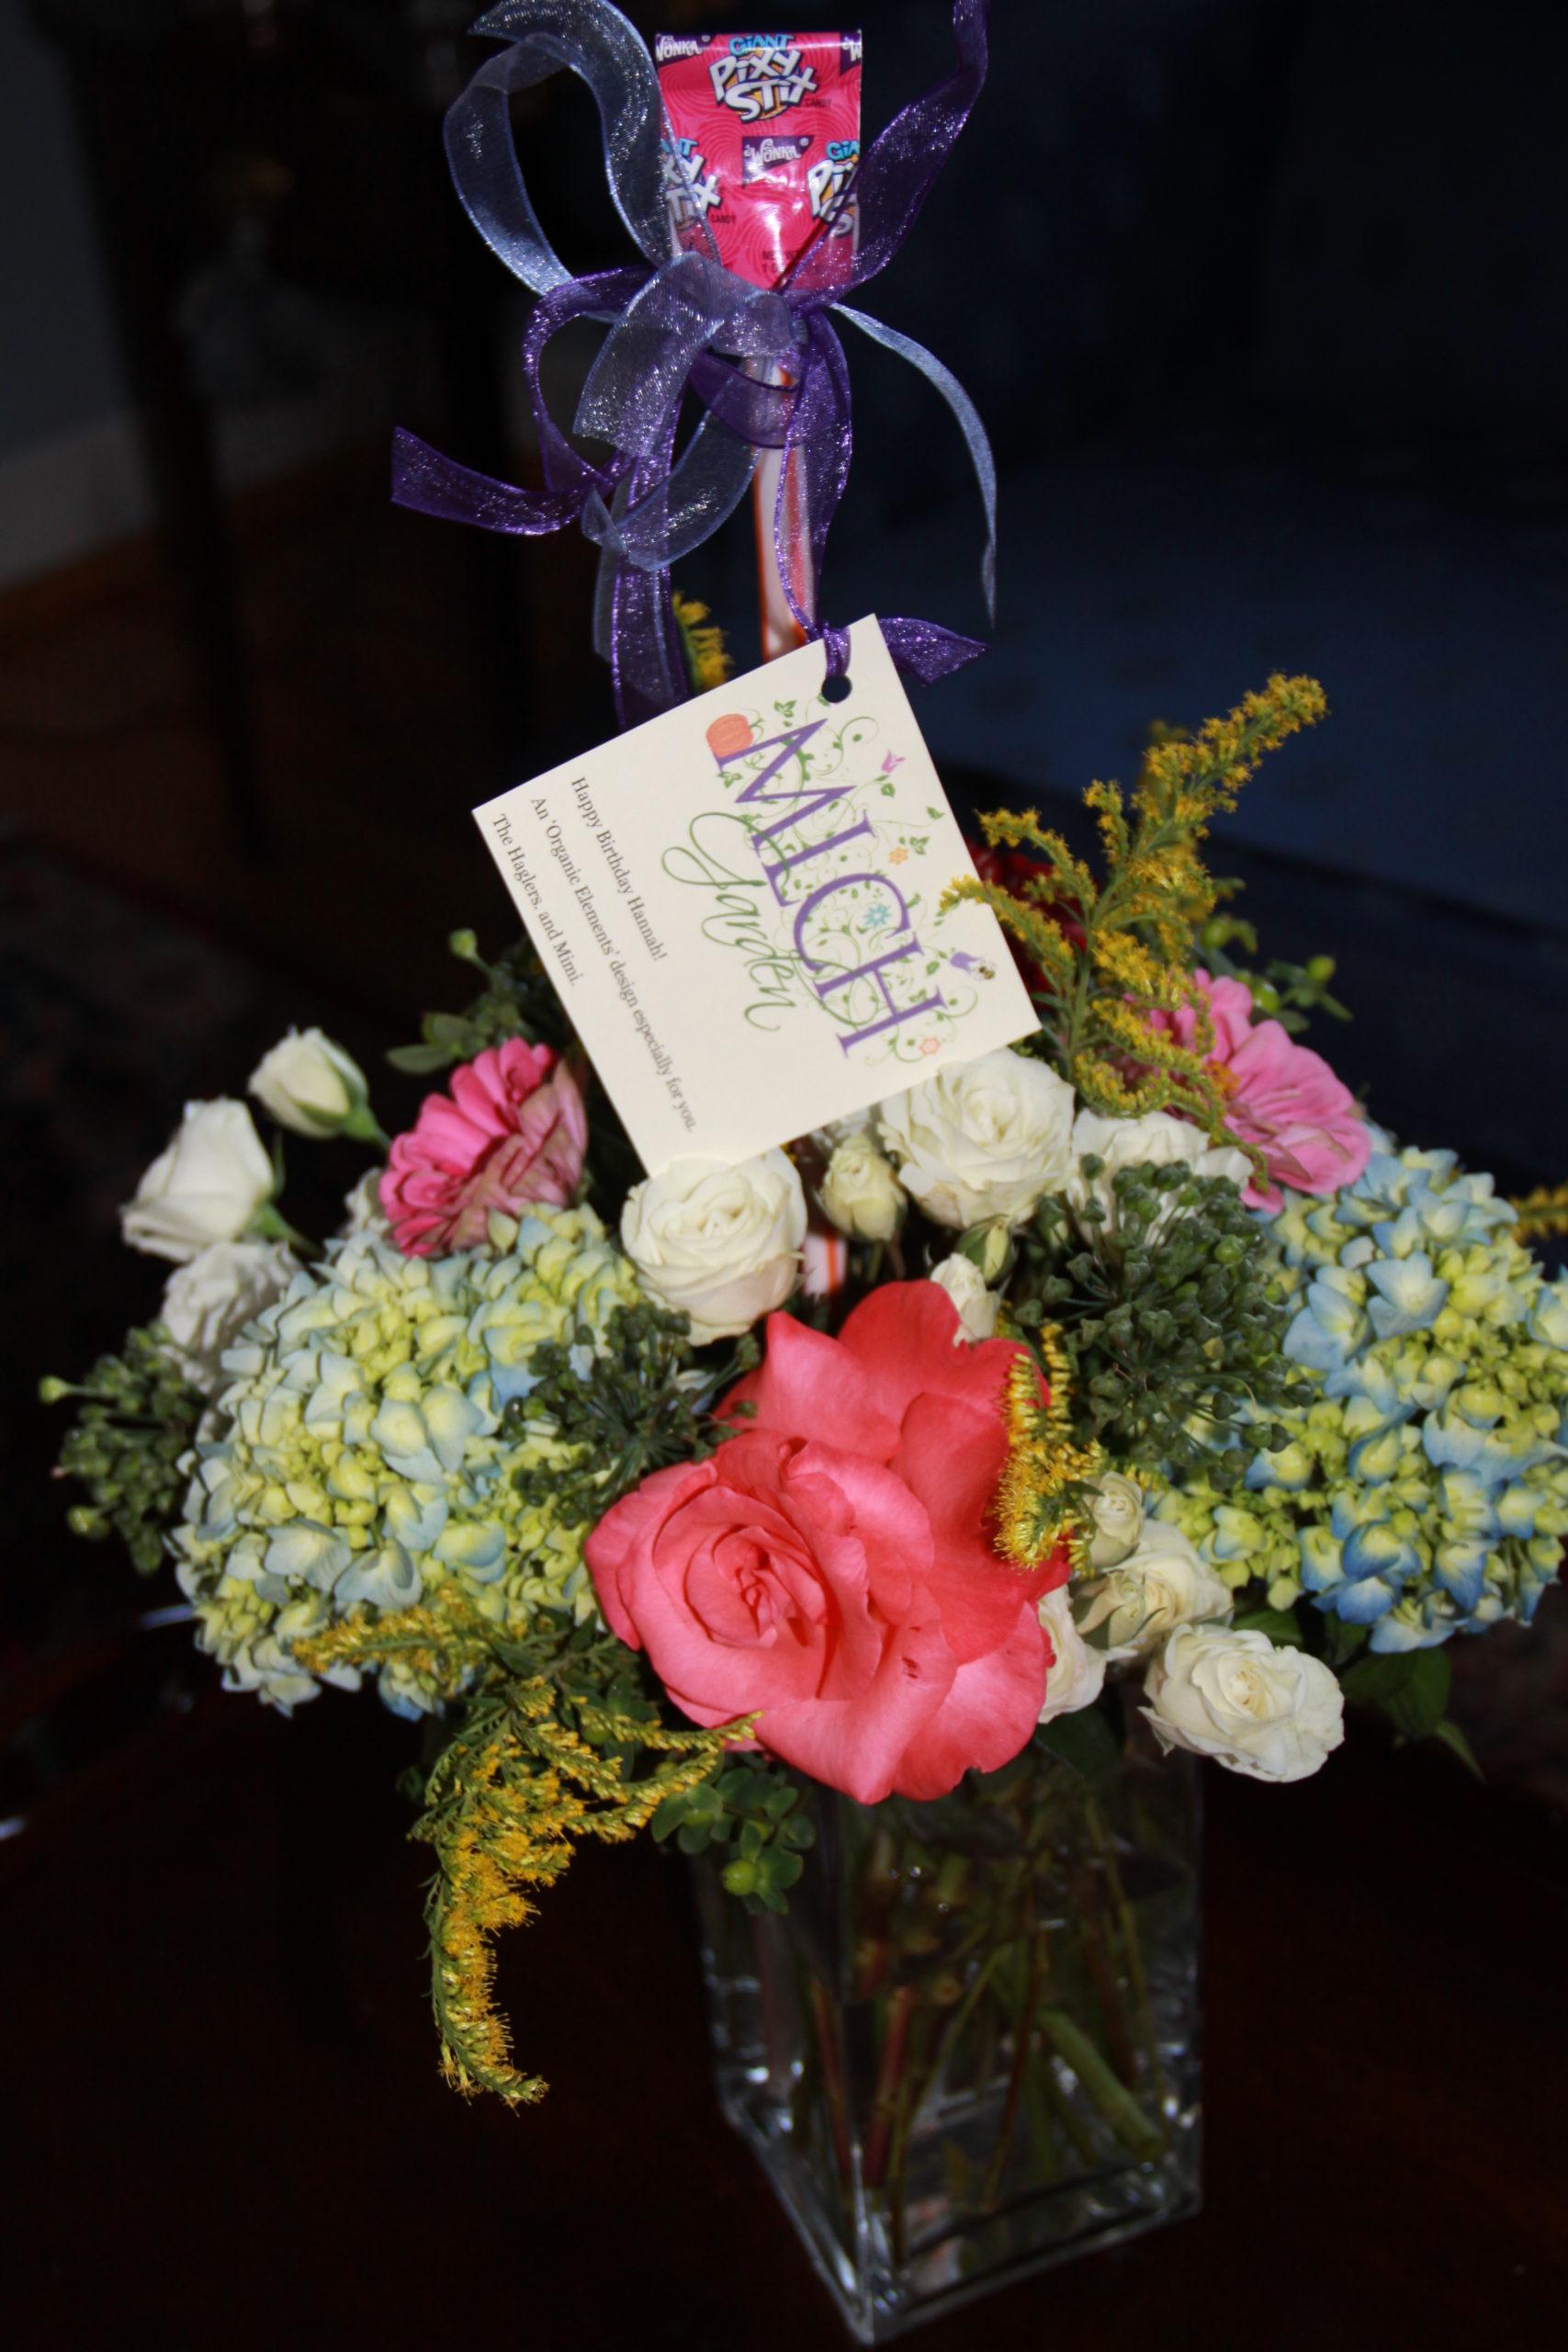 Flower Arranging from Your Garden